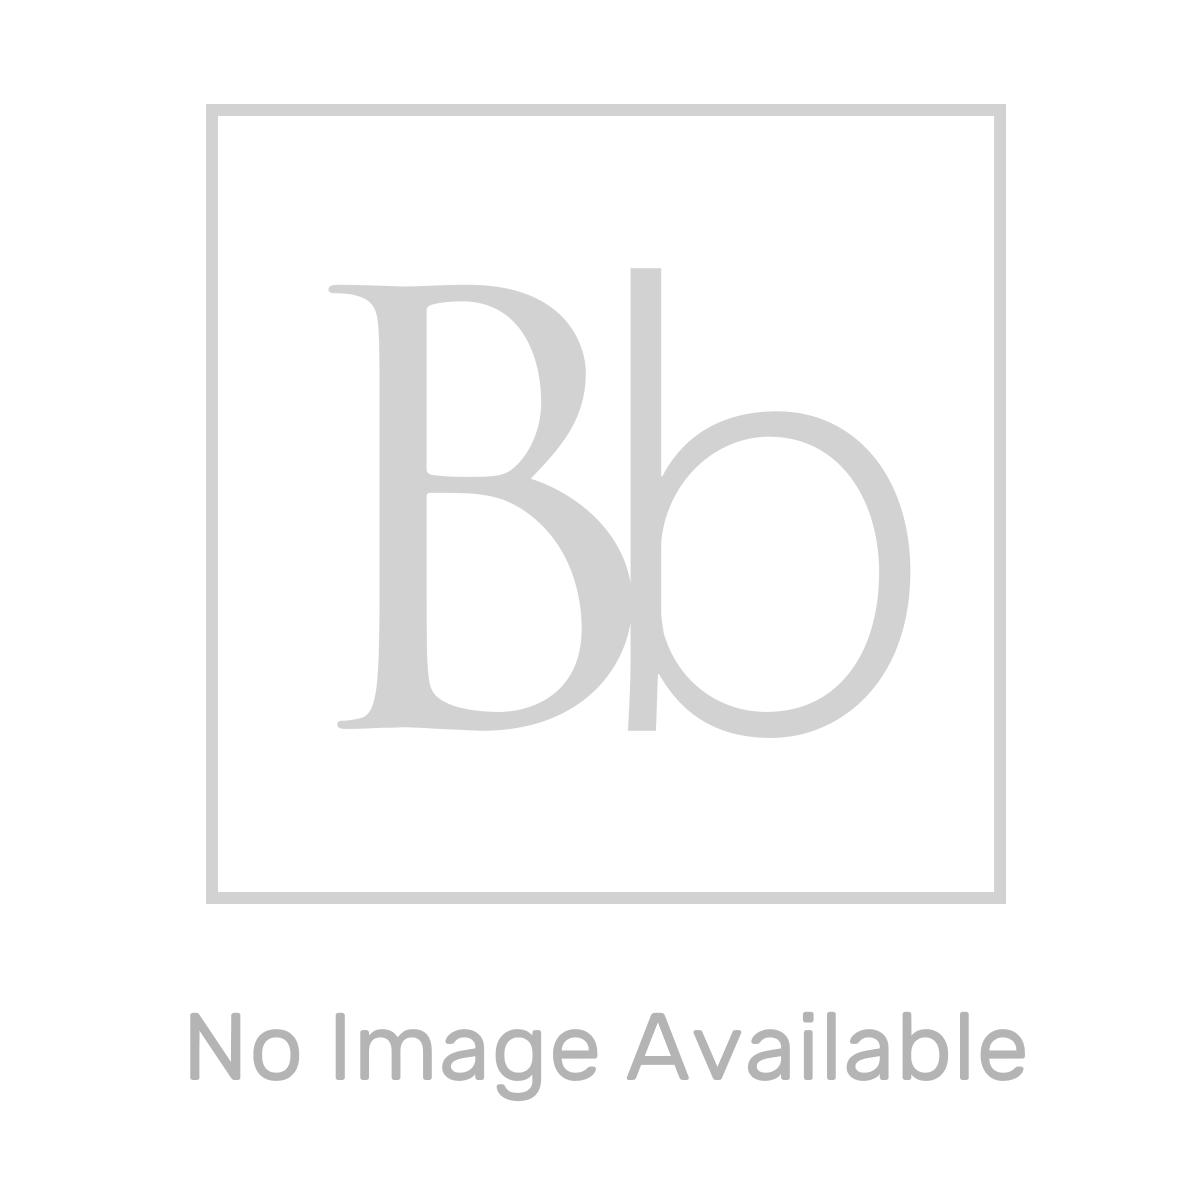 Aquadart White Slate Shower Tray 1200 x 900 Lifestyle